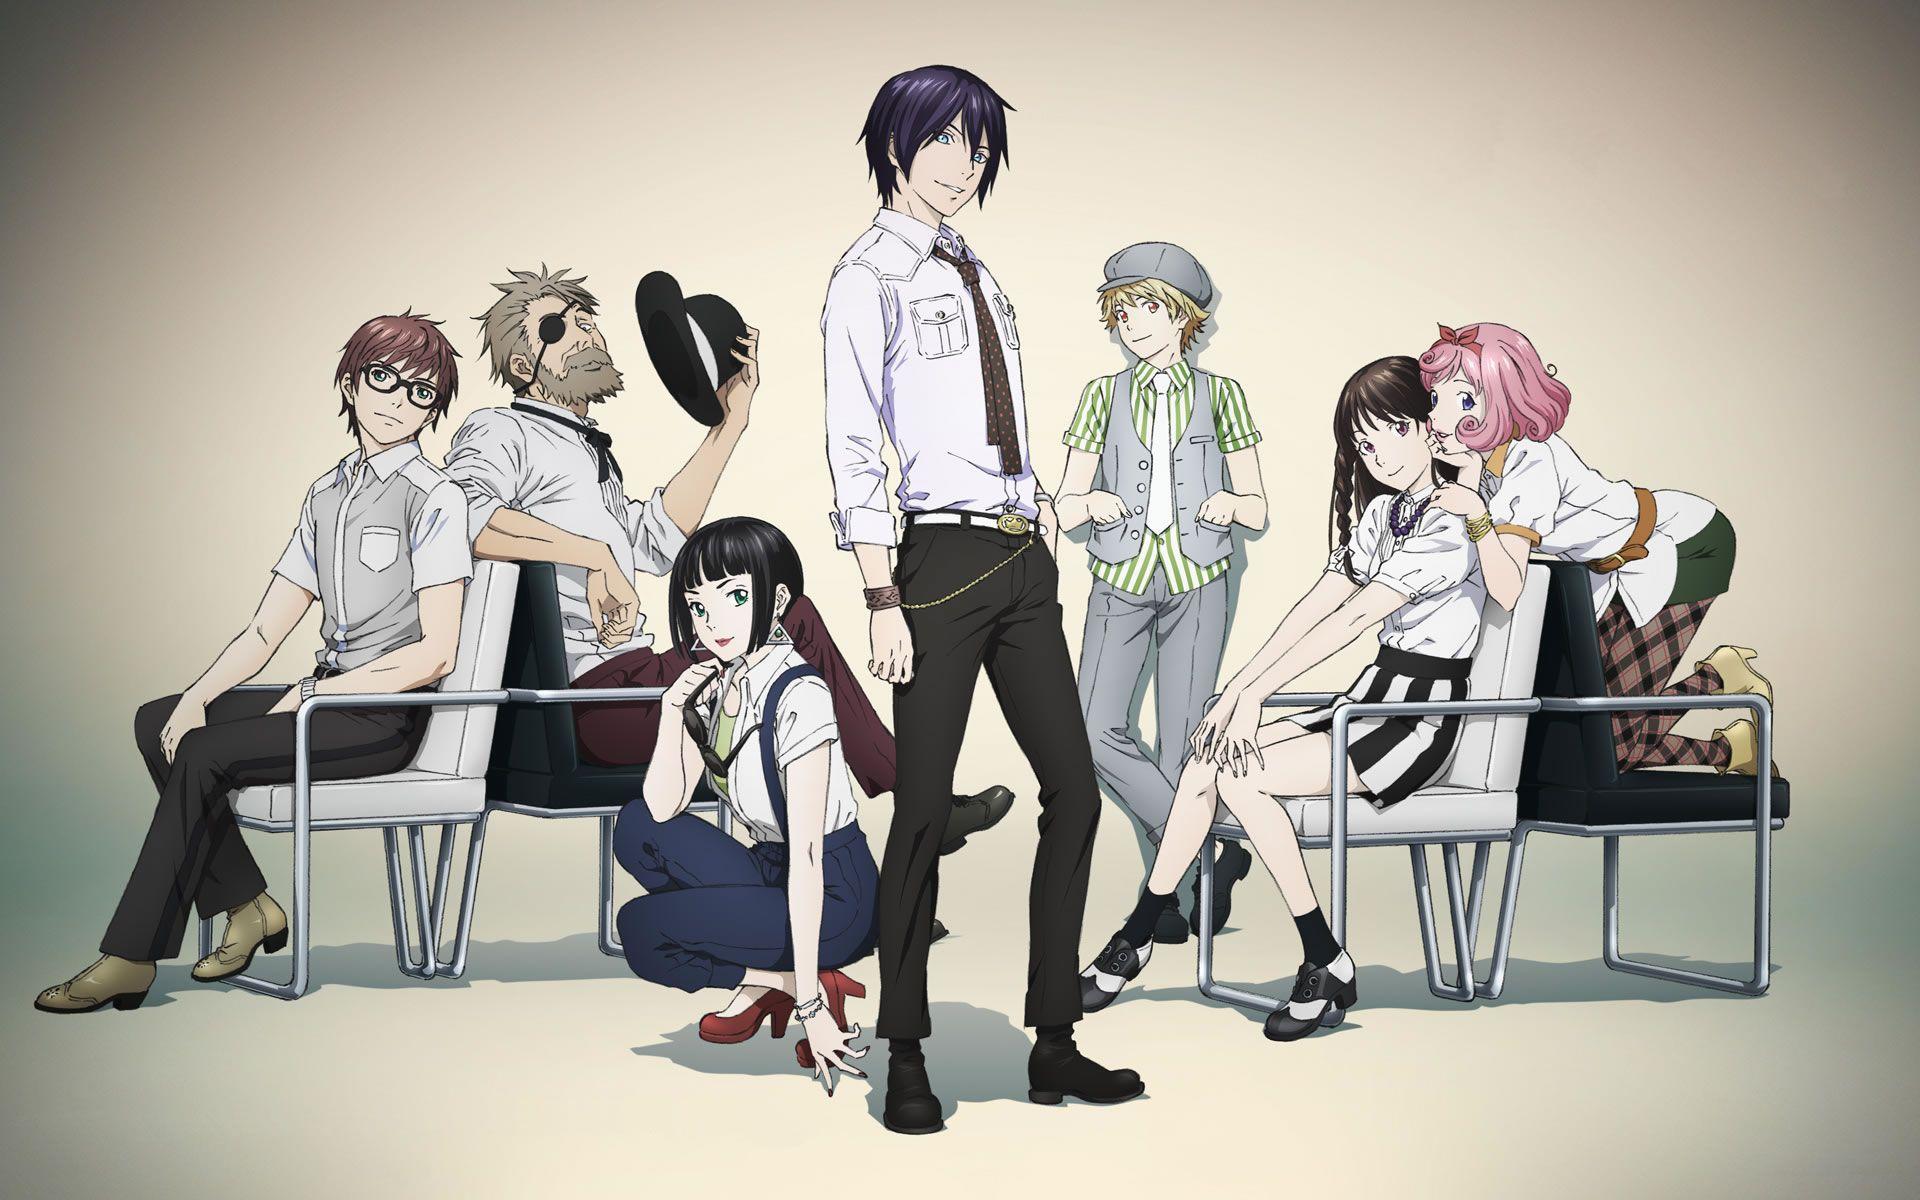 anime and noragami aragoto image | Noragami | Pinterest | Stagioni ...